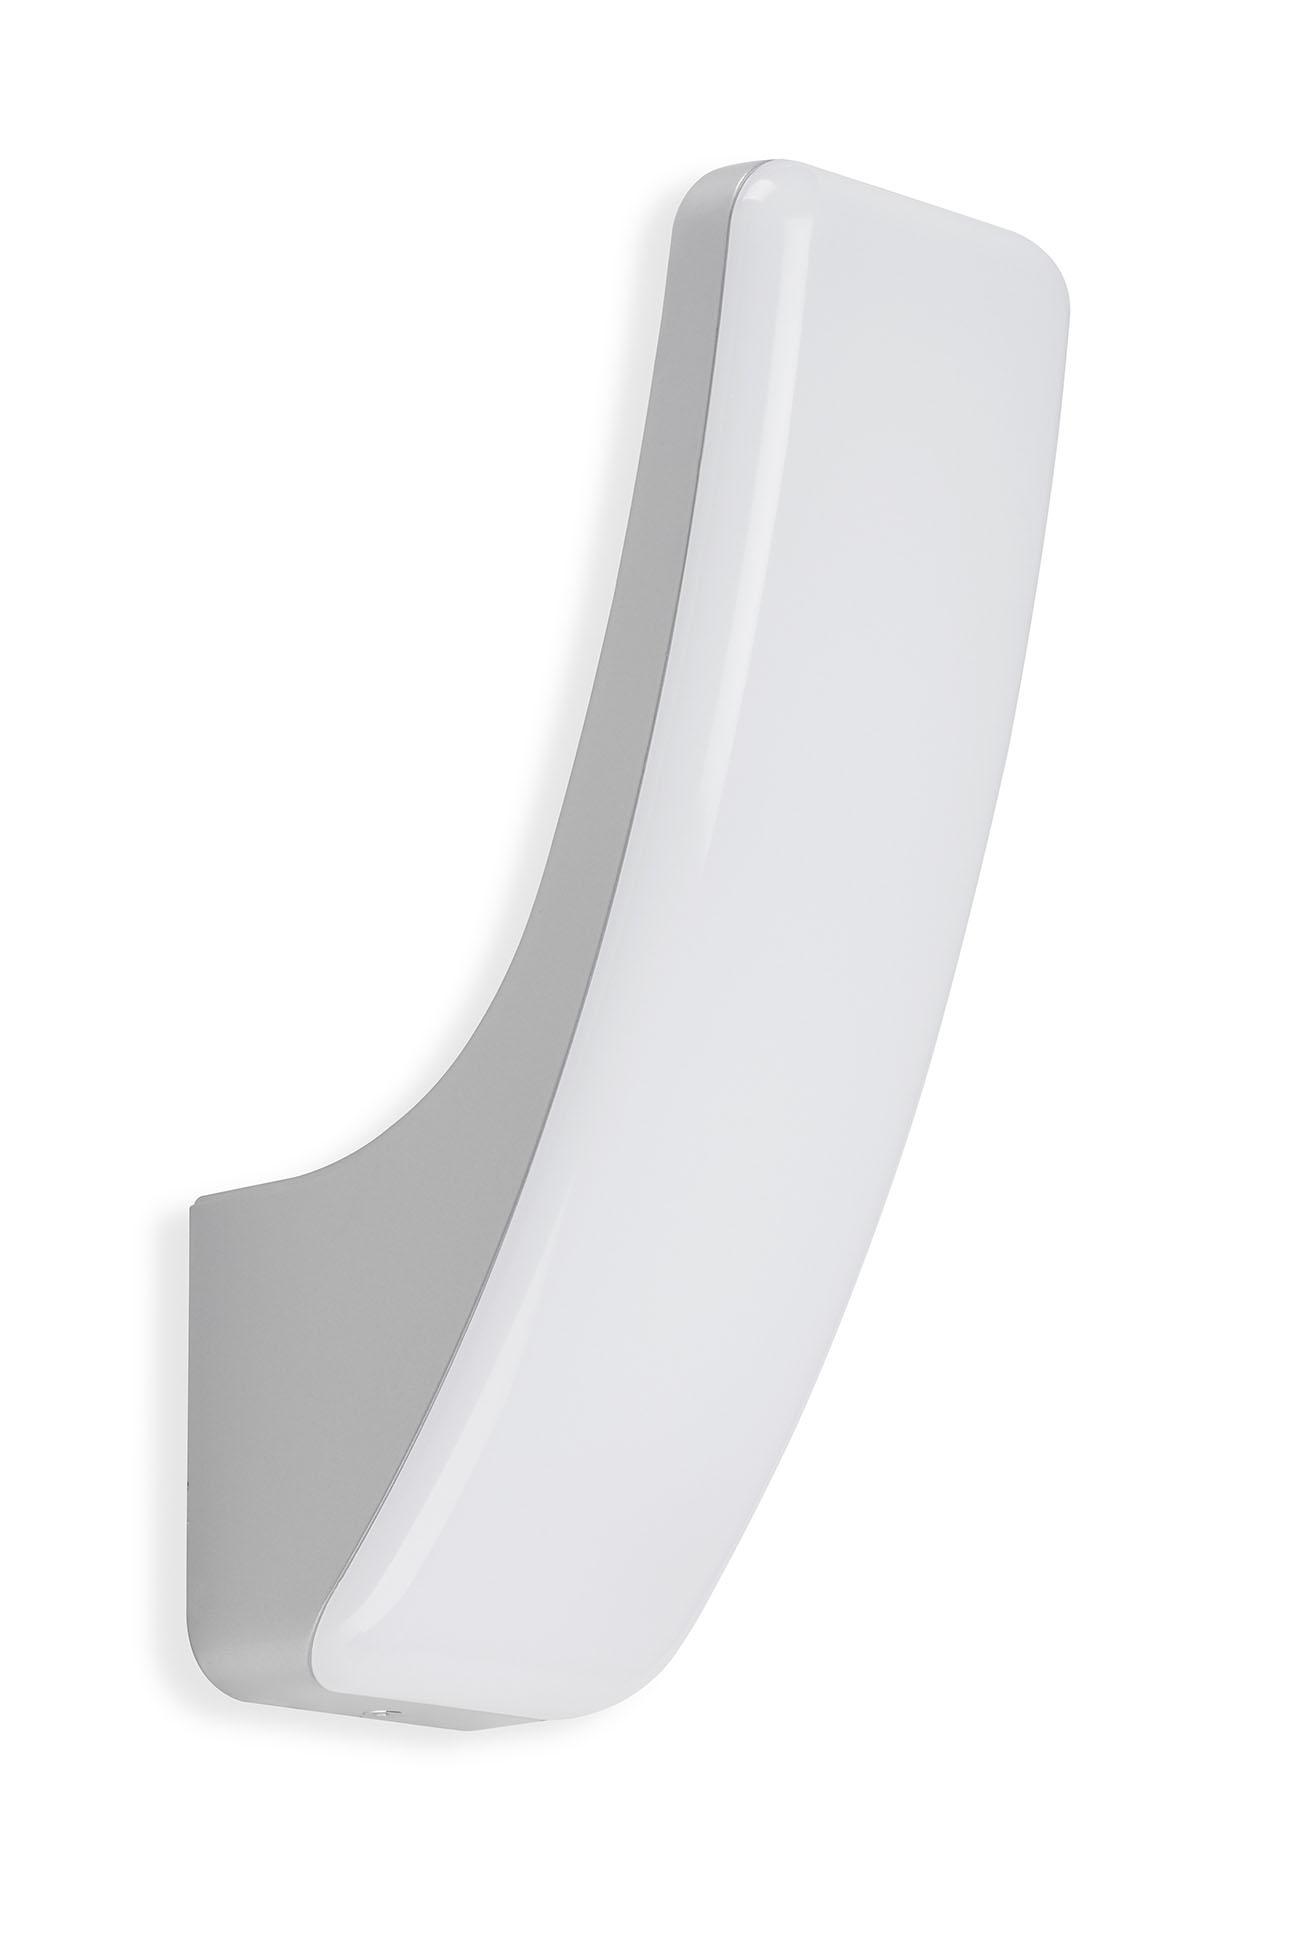 TELEFUNKEN LED Aussenwandleuchte, 33,2 cm, 15 W, Silber